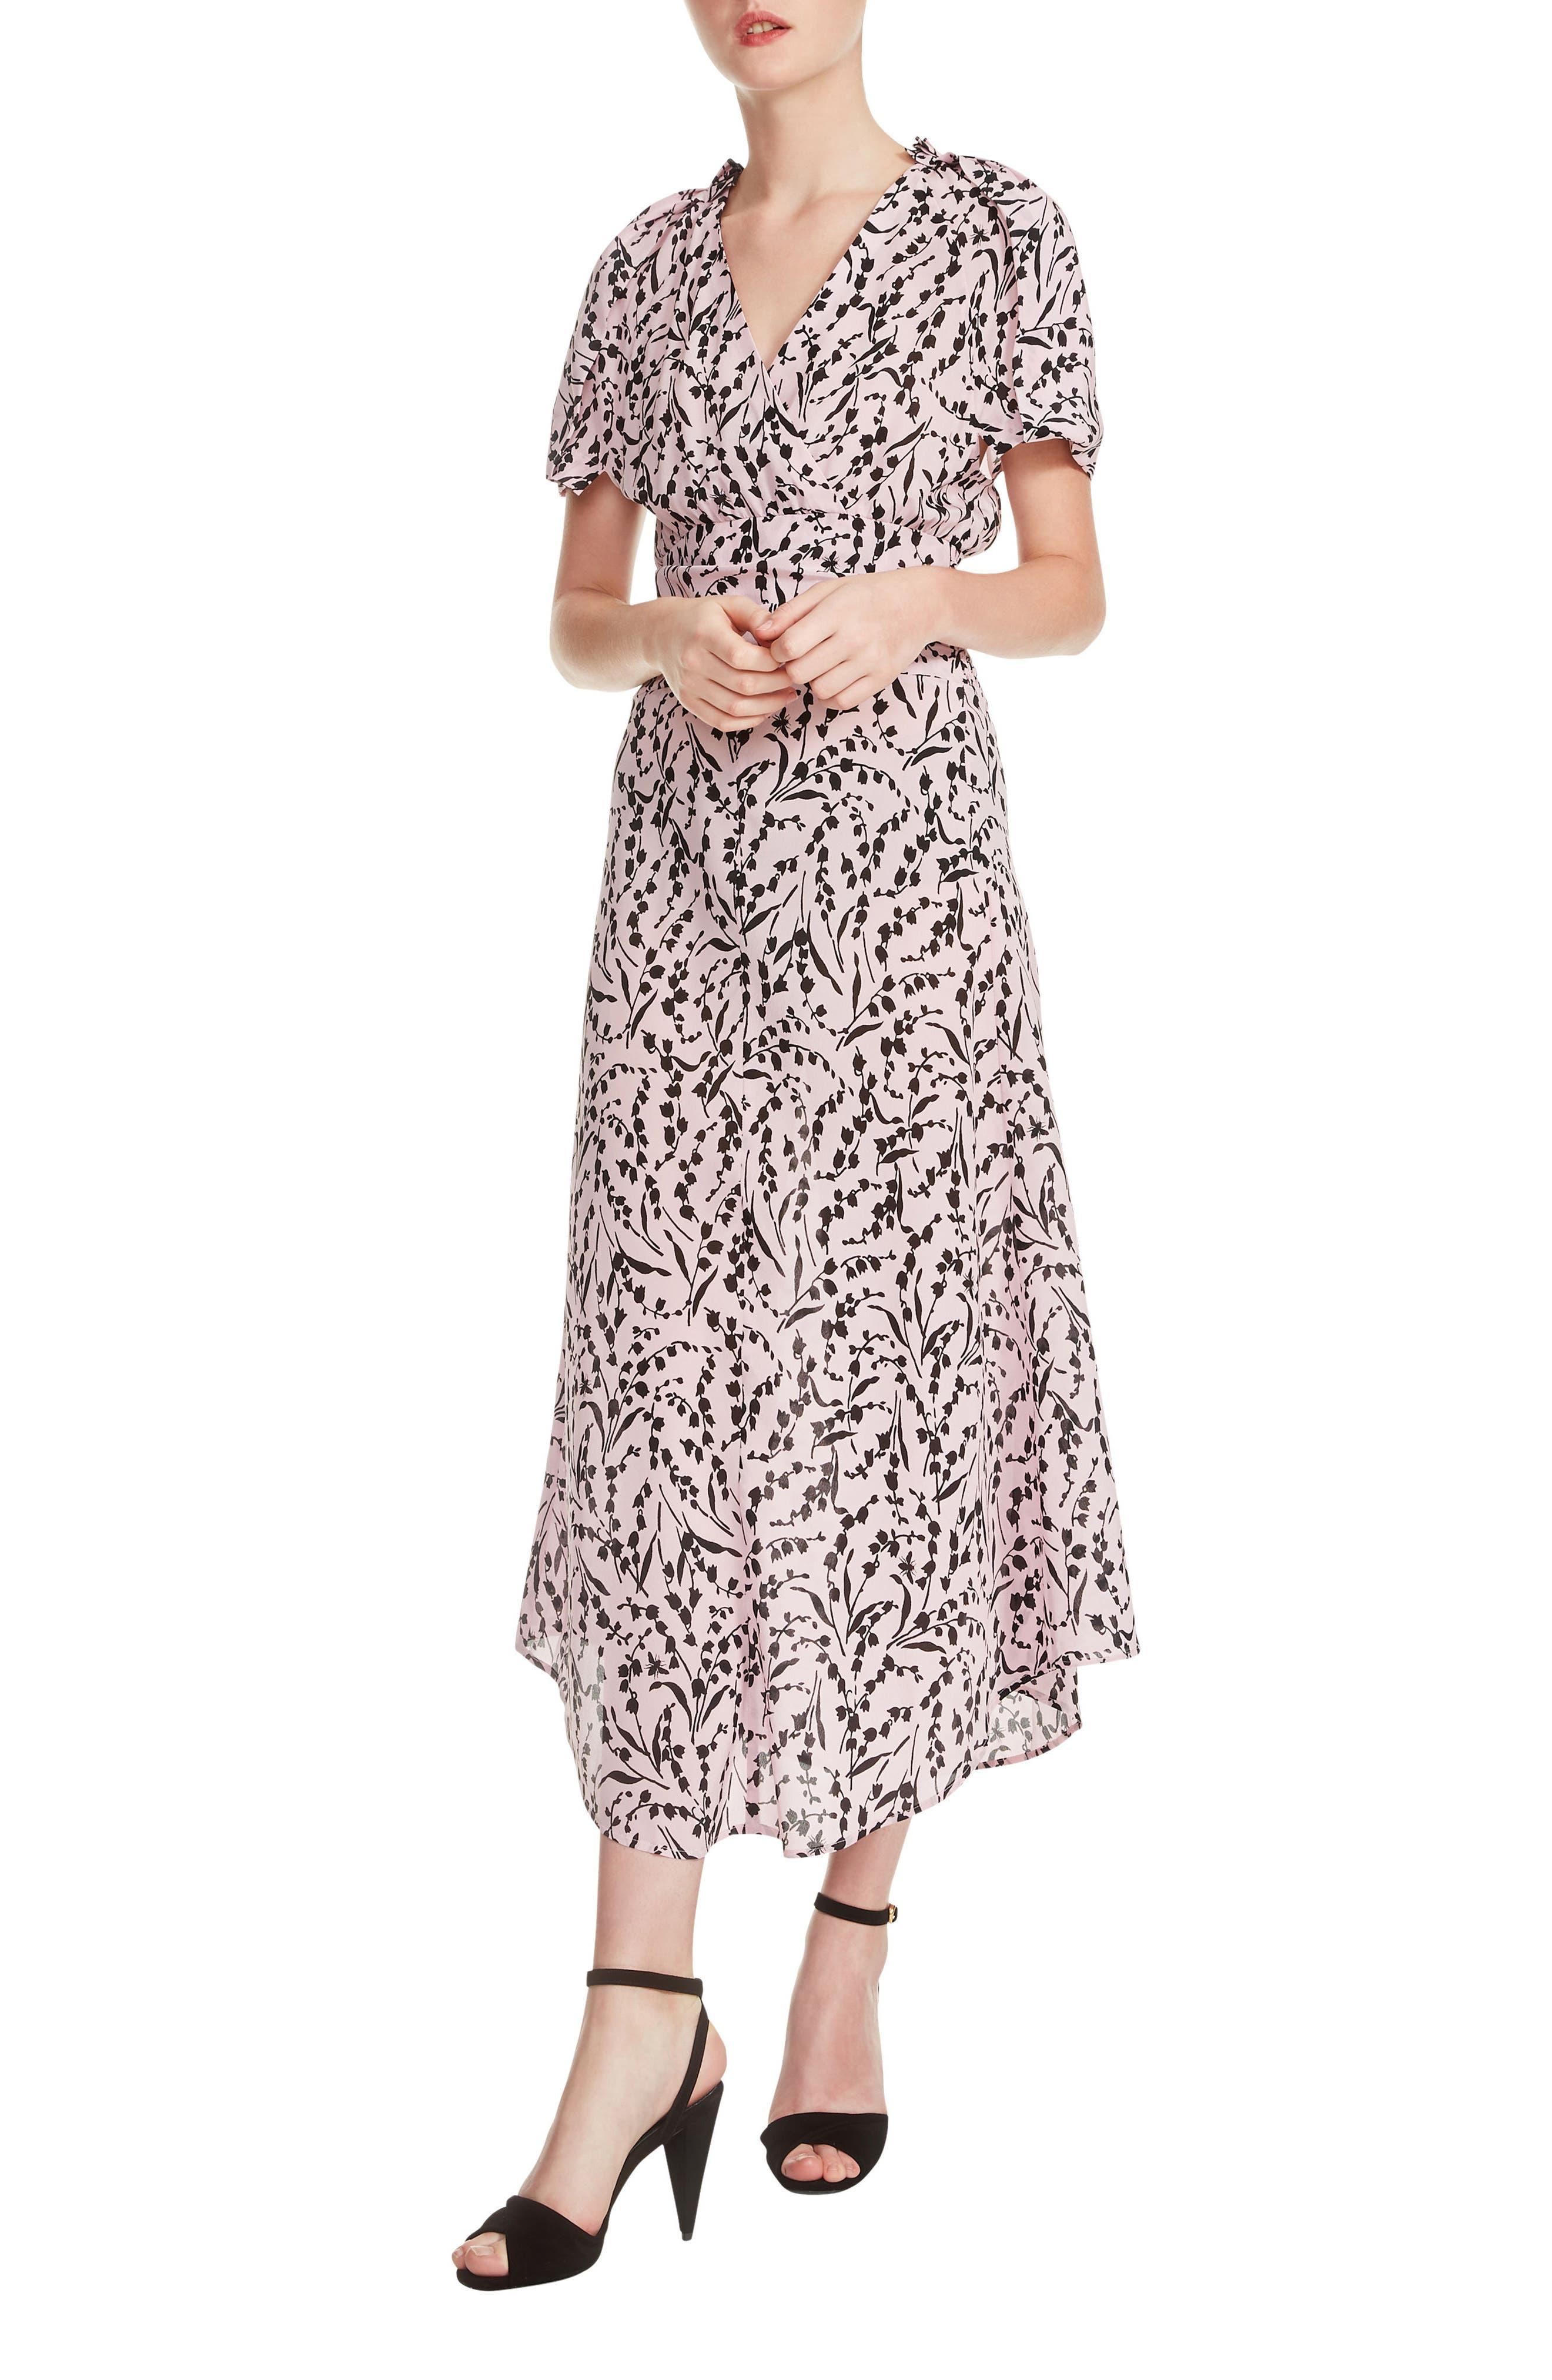 Rivara High/Low Floral Surplice Dress,                             Main thumbnail 1, color,                             Printed